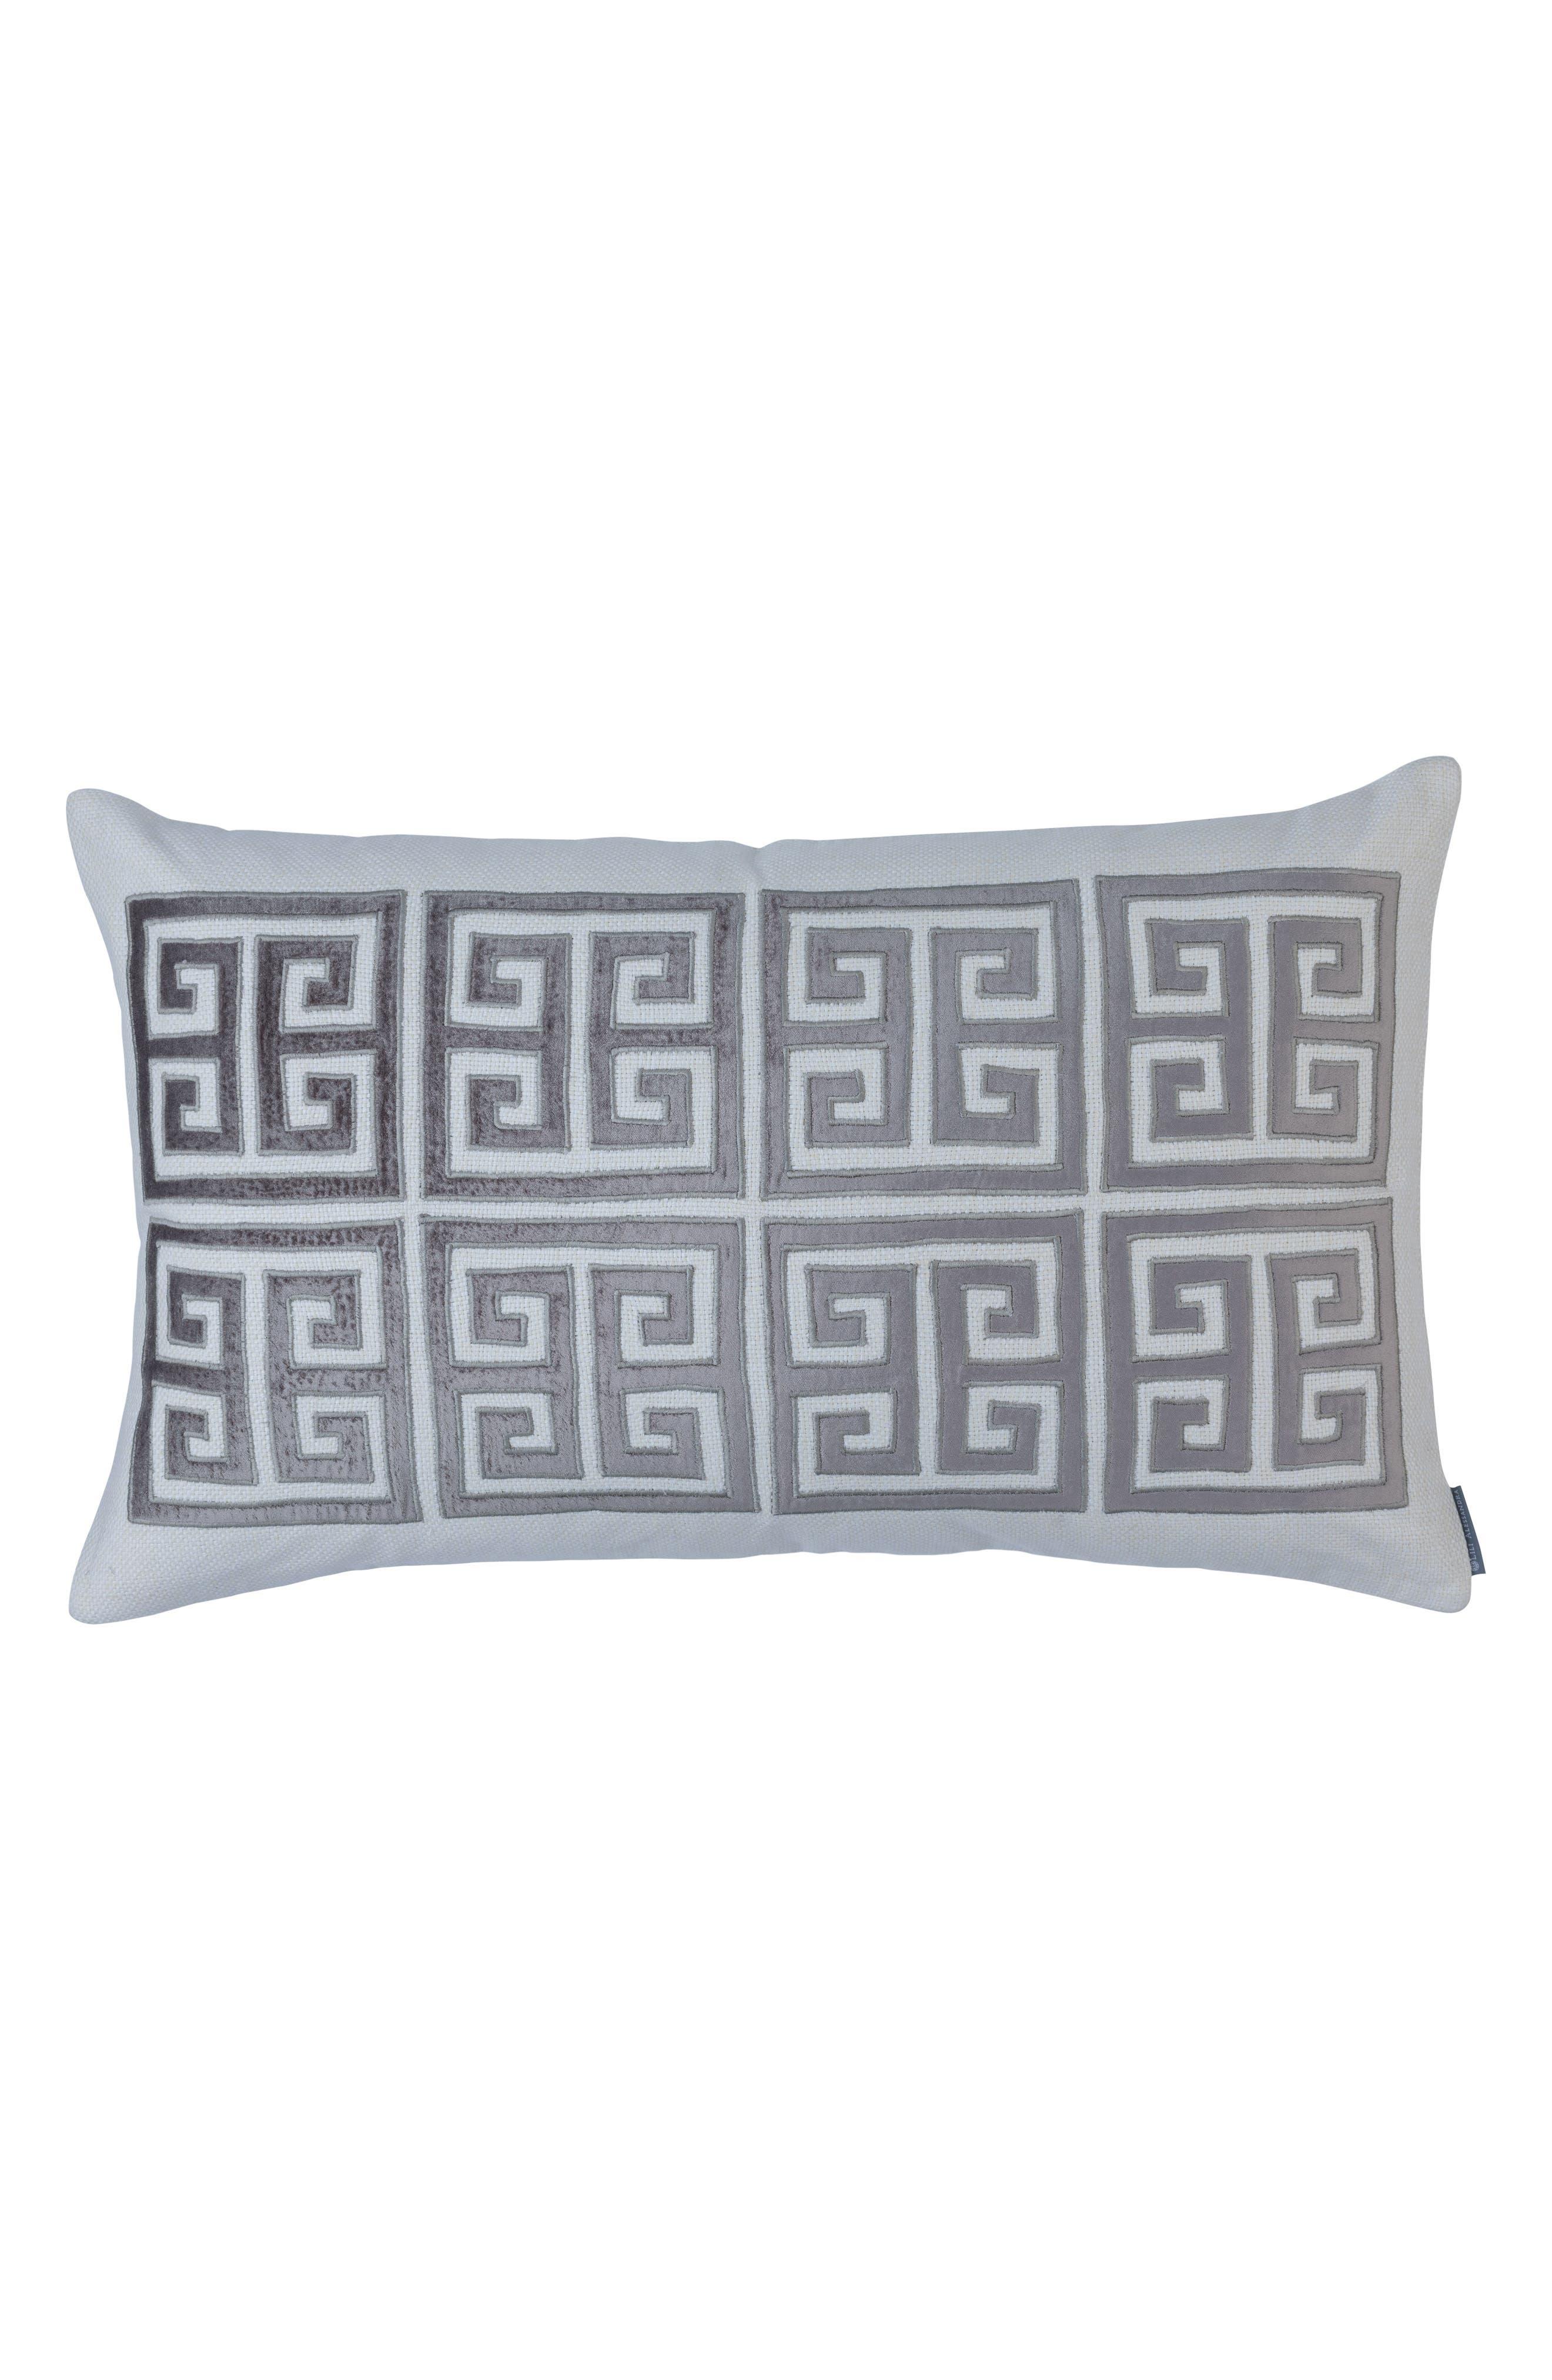 Guy Velvet Basket Weave Large Accent Pillow,                             Main thumbnail 1, color,                             GRAY